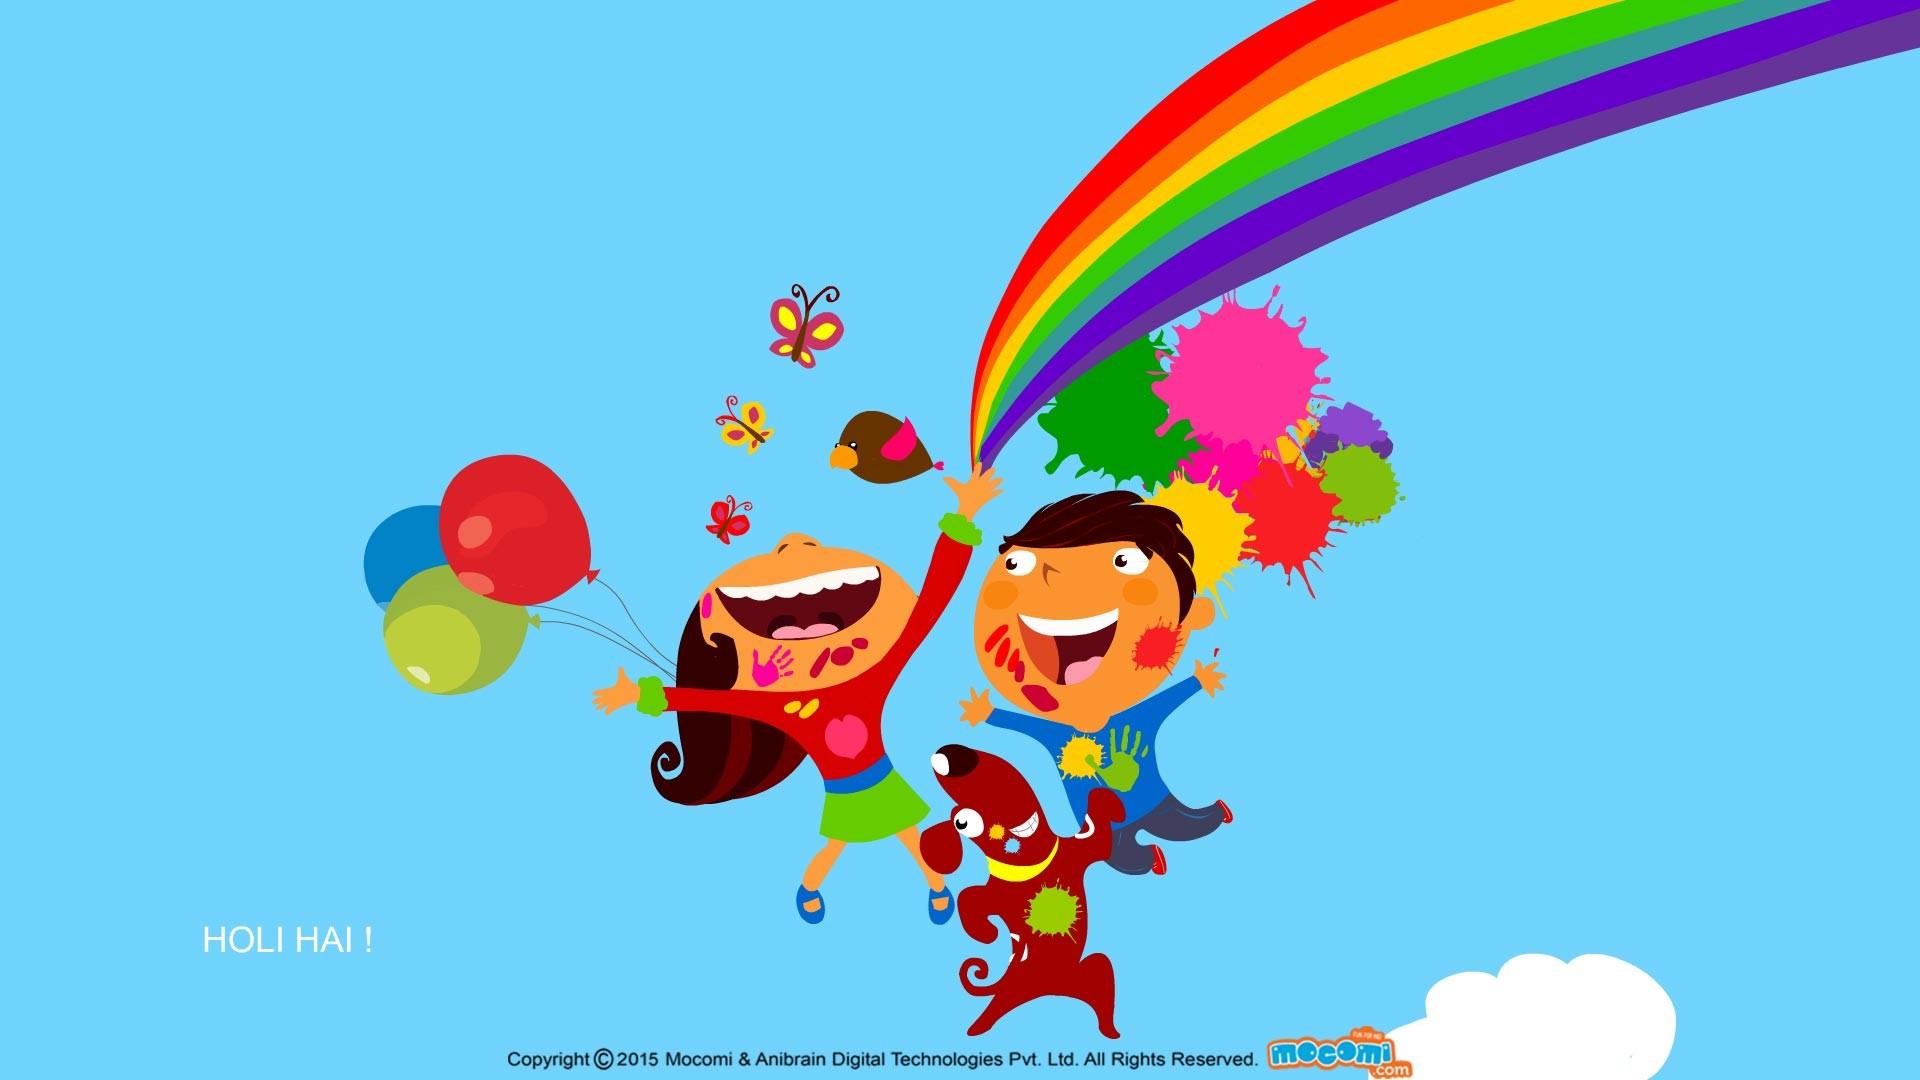 Res: 1920x1080, Holi fun - Desktop Wallpapers for kids | Mocomi